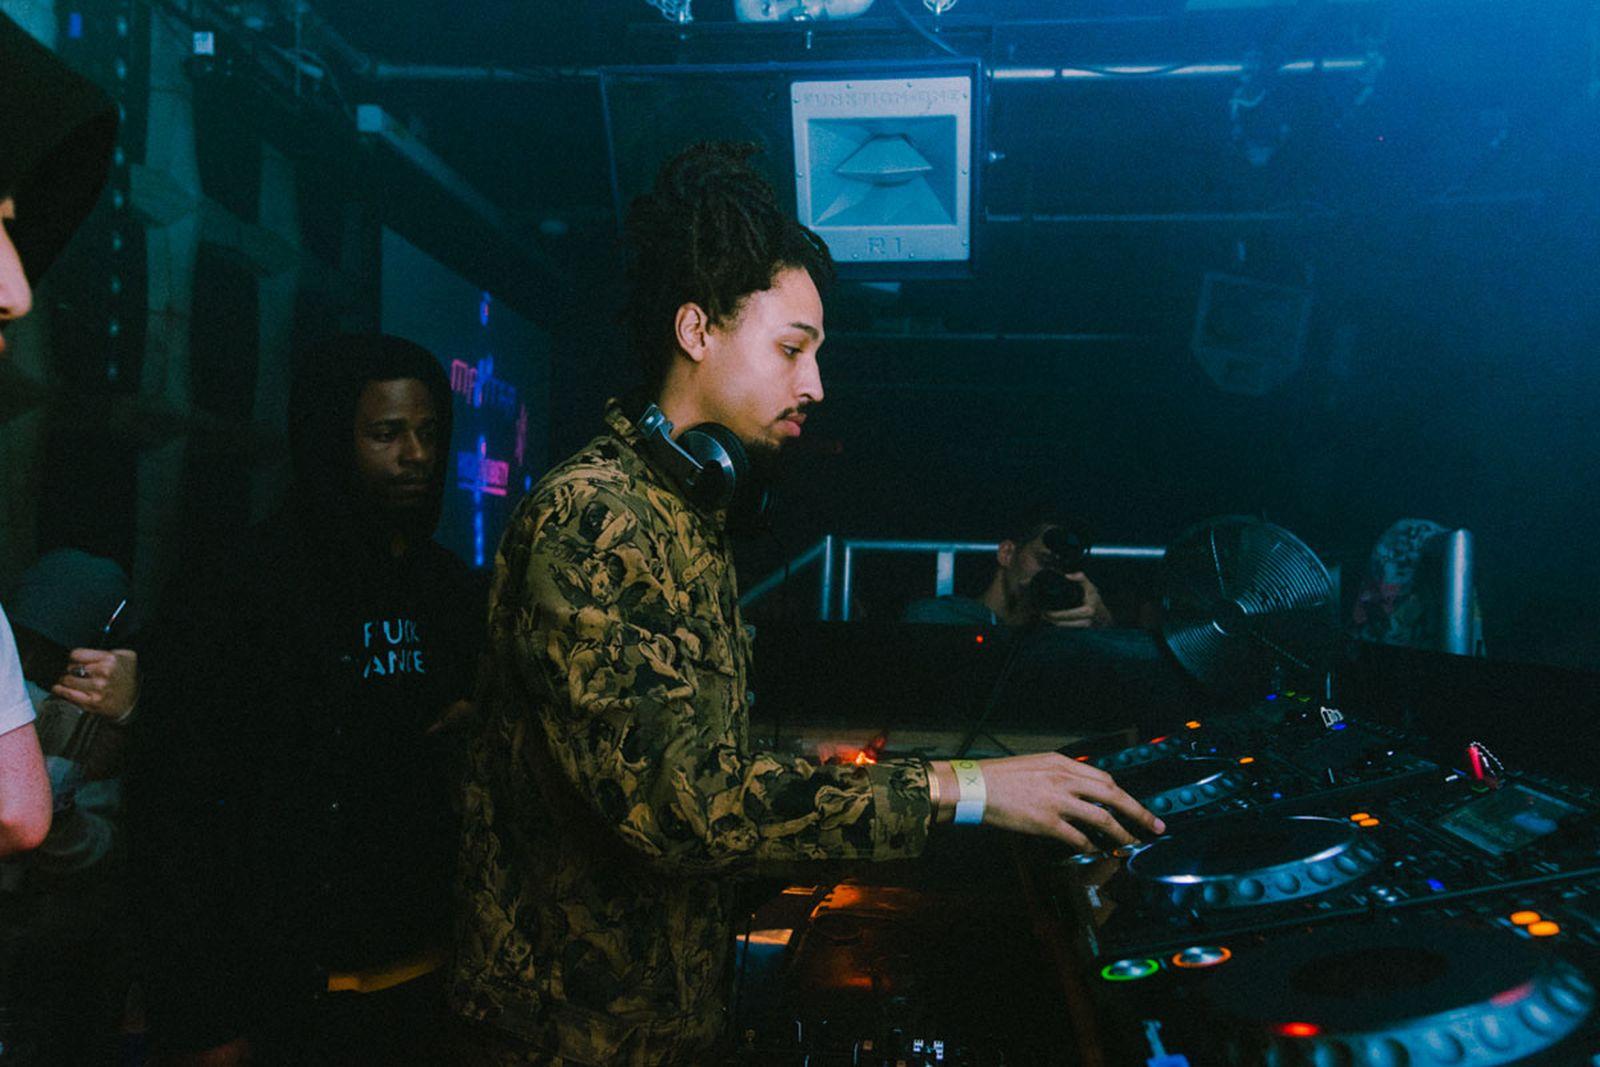 Mantra x High Snob london soundsystem